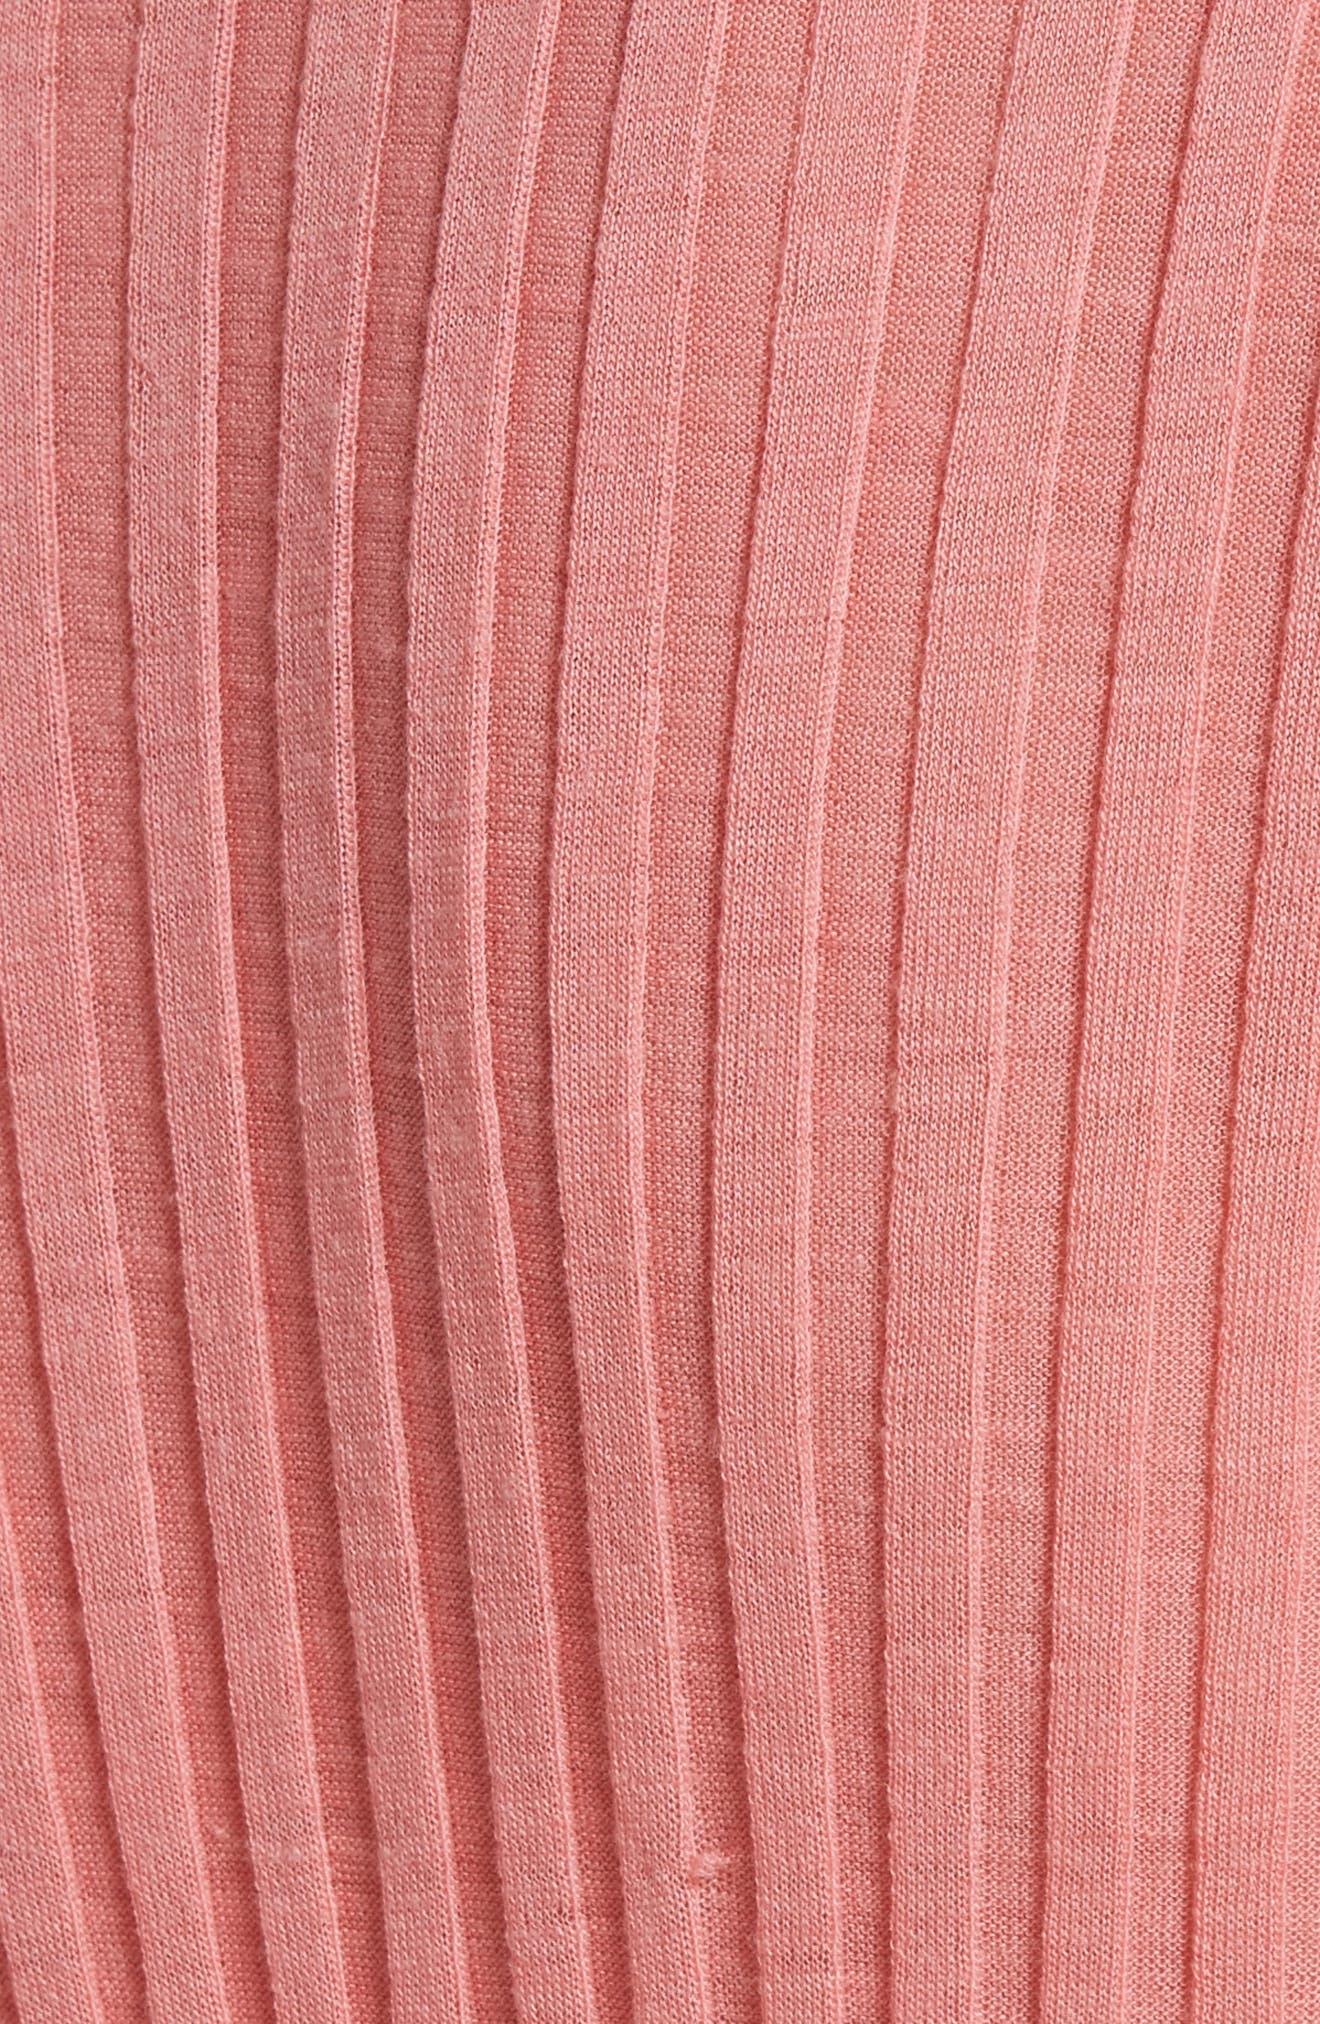 Diane von Furstenberg Ribbed Sweater,                             Alternate thumbnail 5, color,                             670